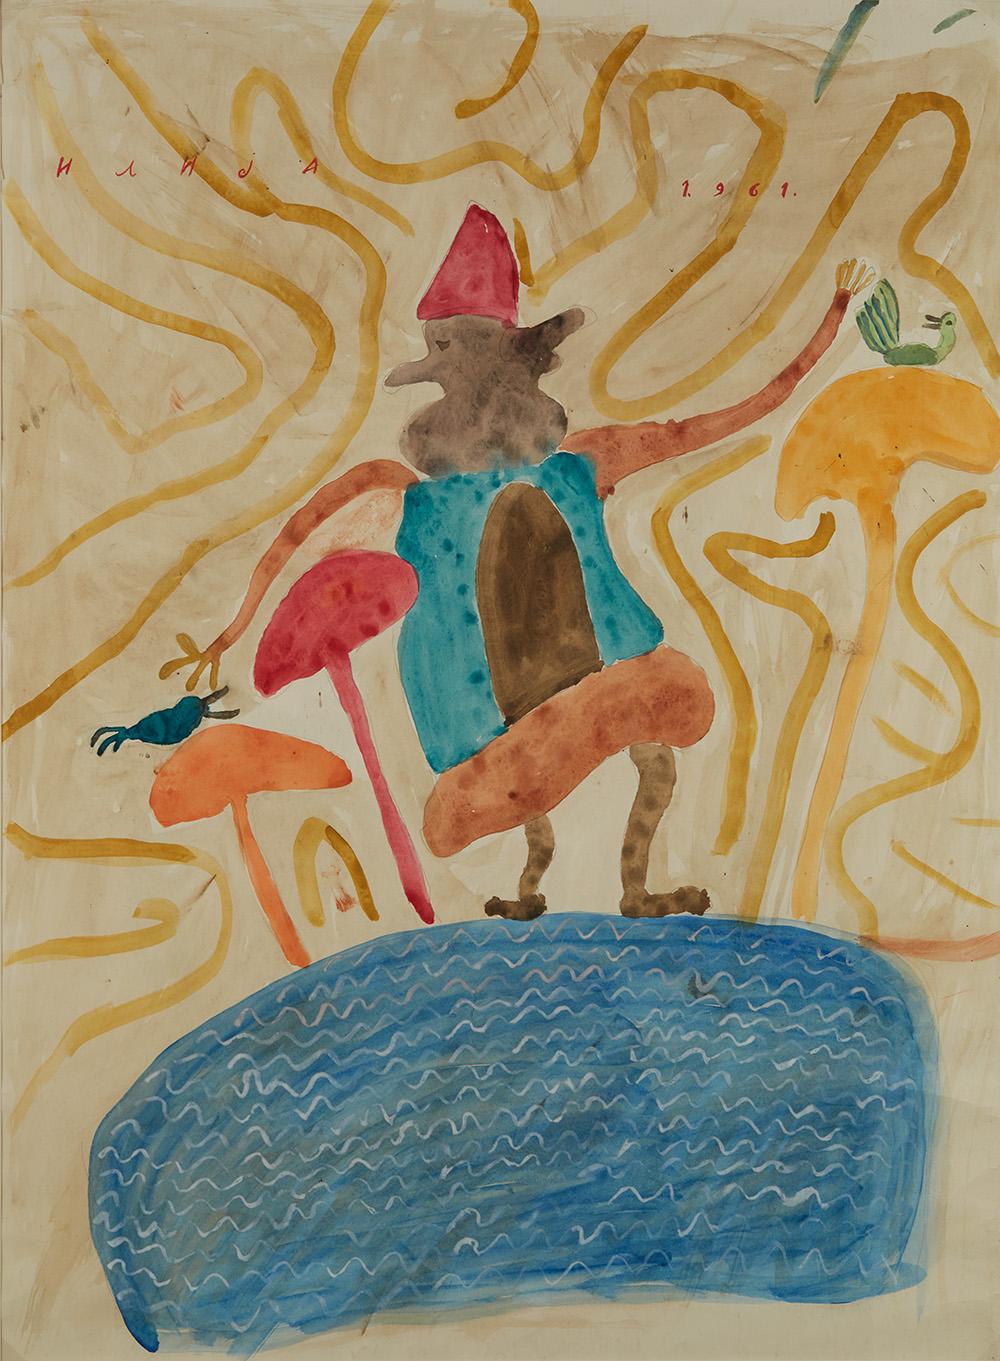 Ilija Bosilj Bašičević    Two Faced Man Walking On Water  , 1961 Gouache on paper 30.75 x 22.5 inches 78.1 x 57.2 cm IBo 3